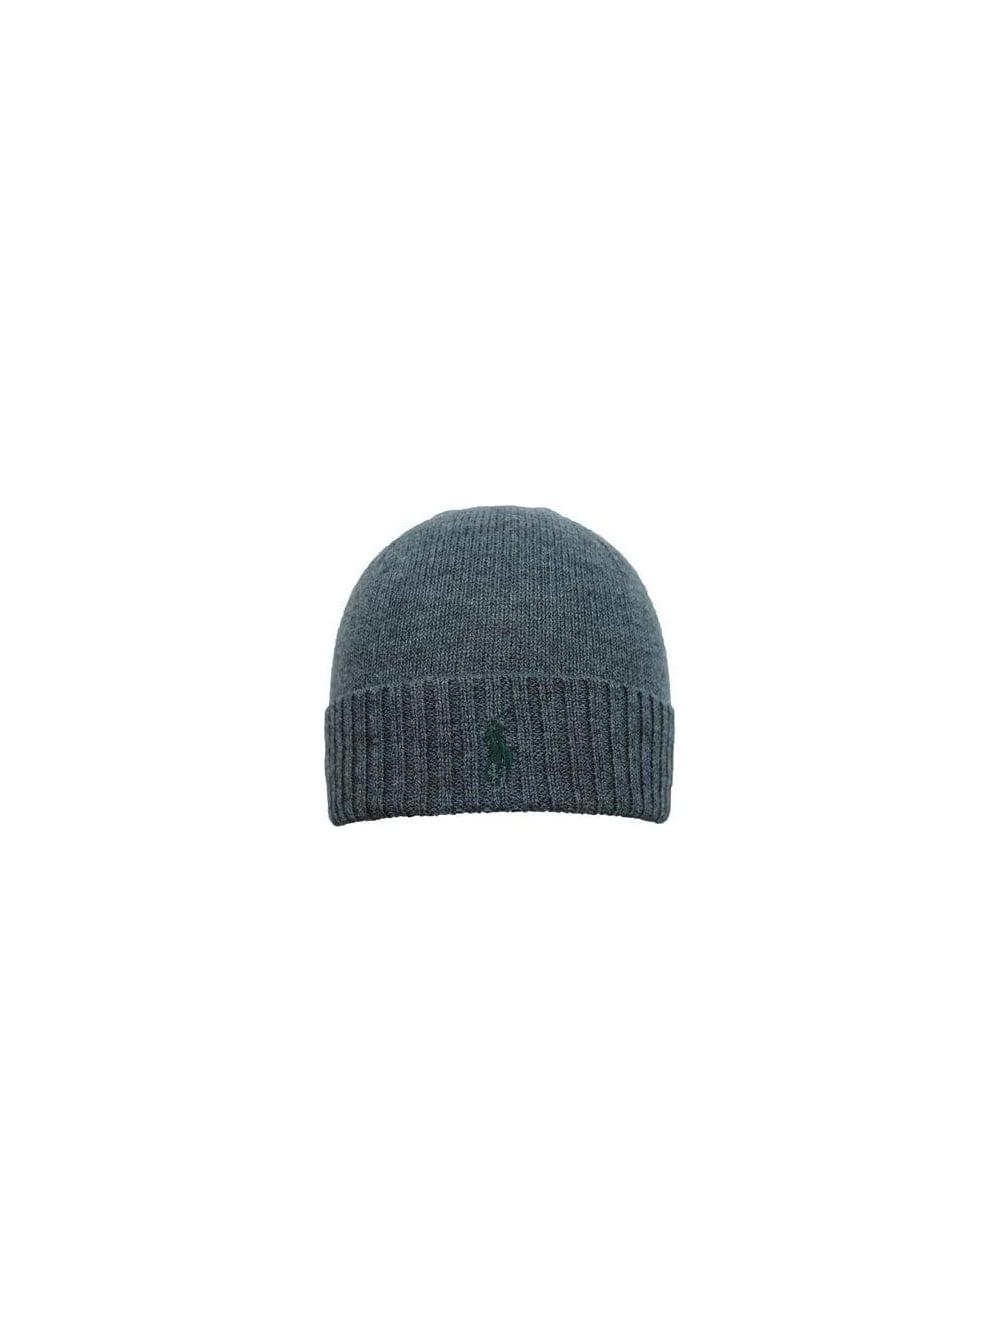 Ralph Lauren Merino Wool Hat in Grey - Northern Threads ccea13e4566